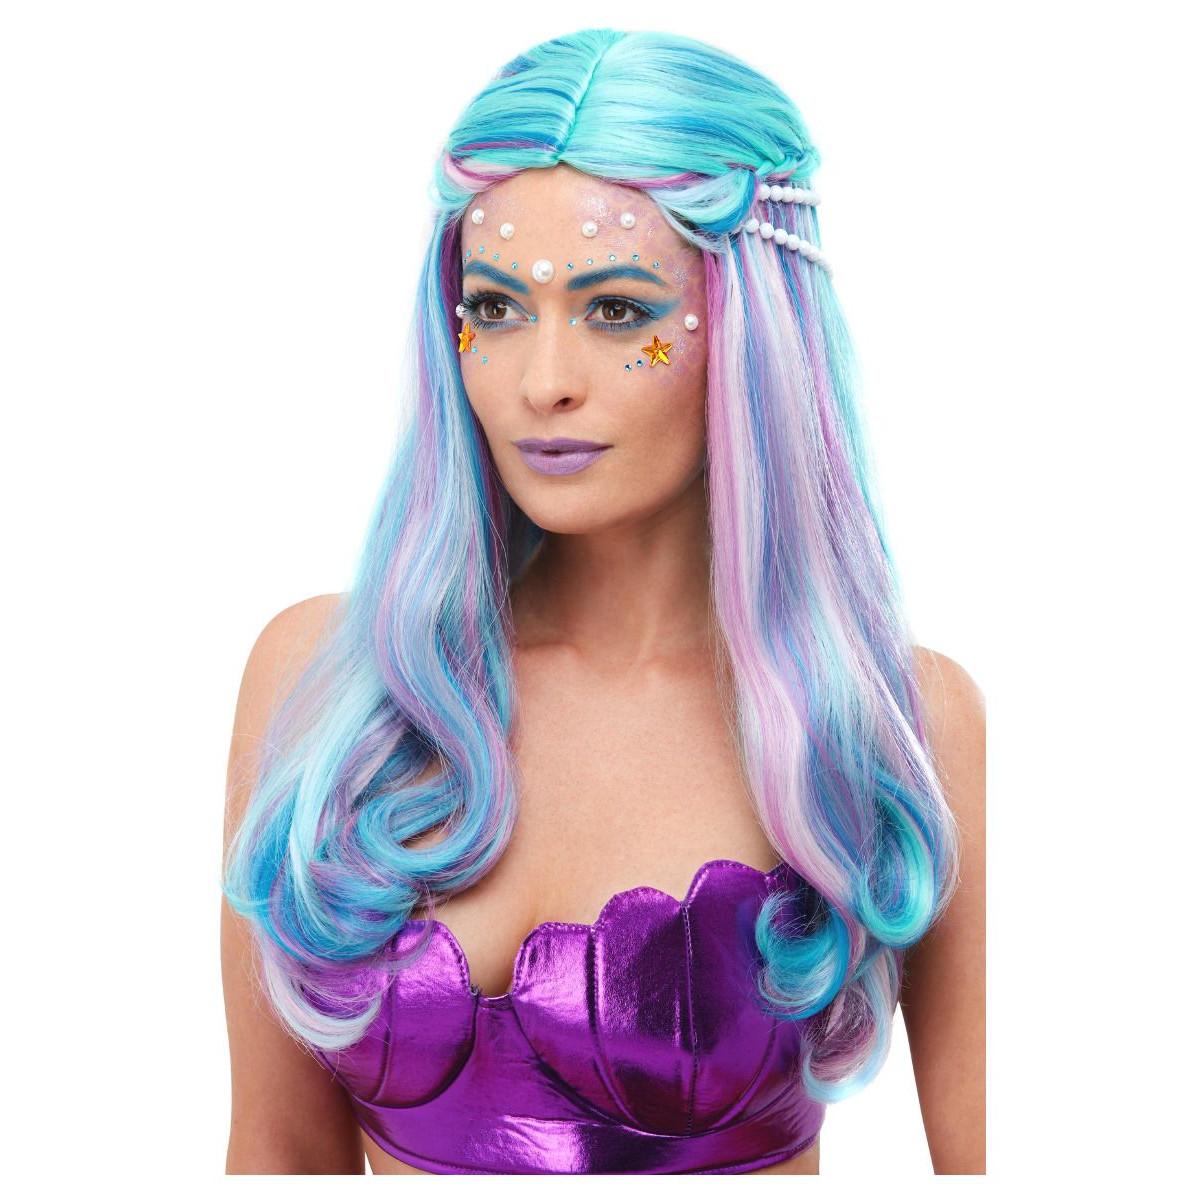 Sirena sirena